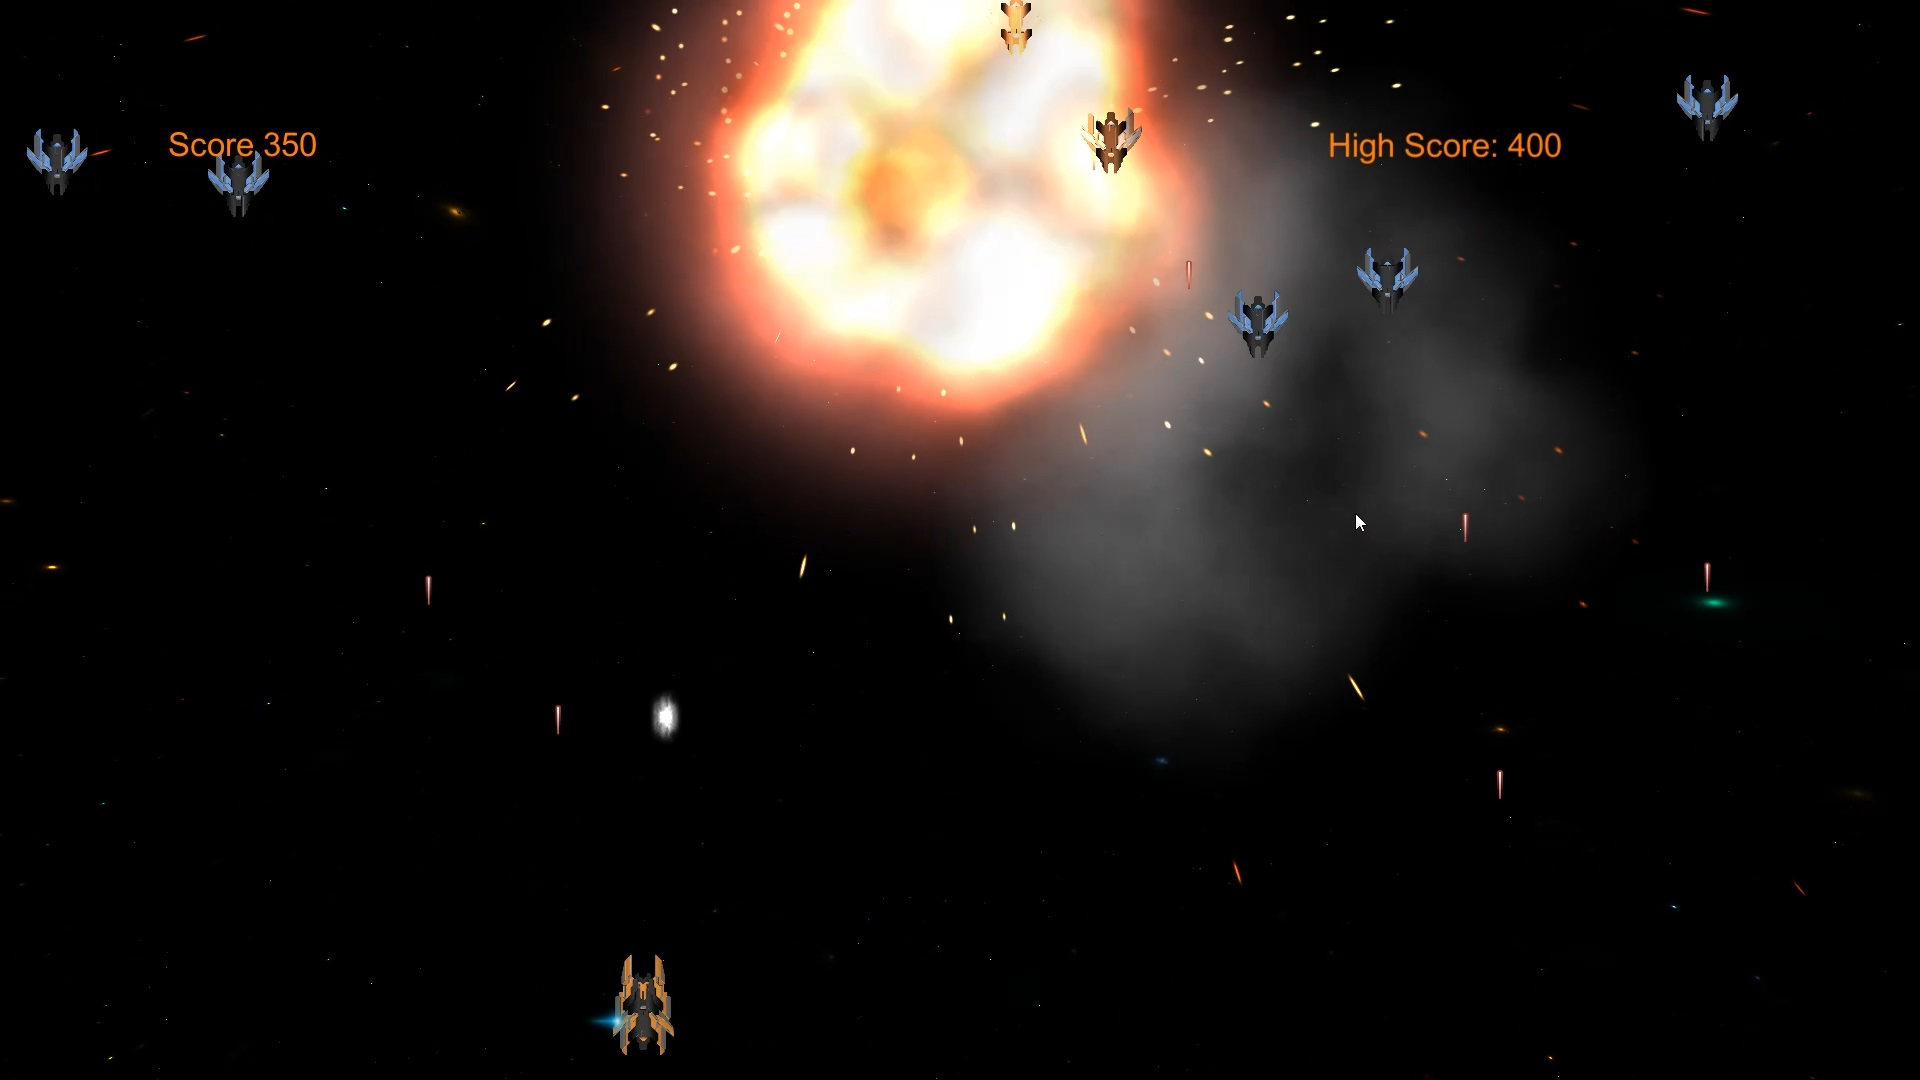 Space Apocalypse By SirVyvor